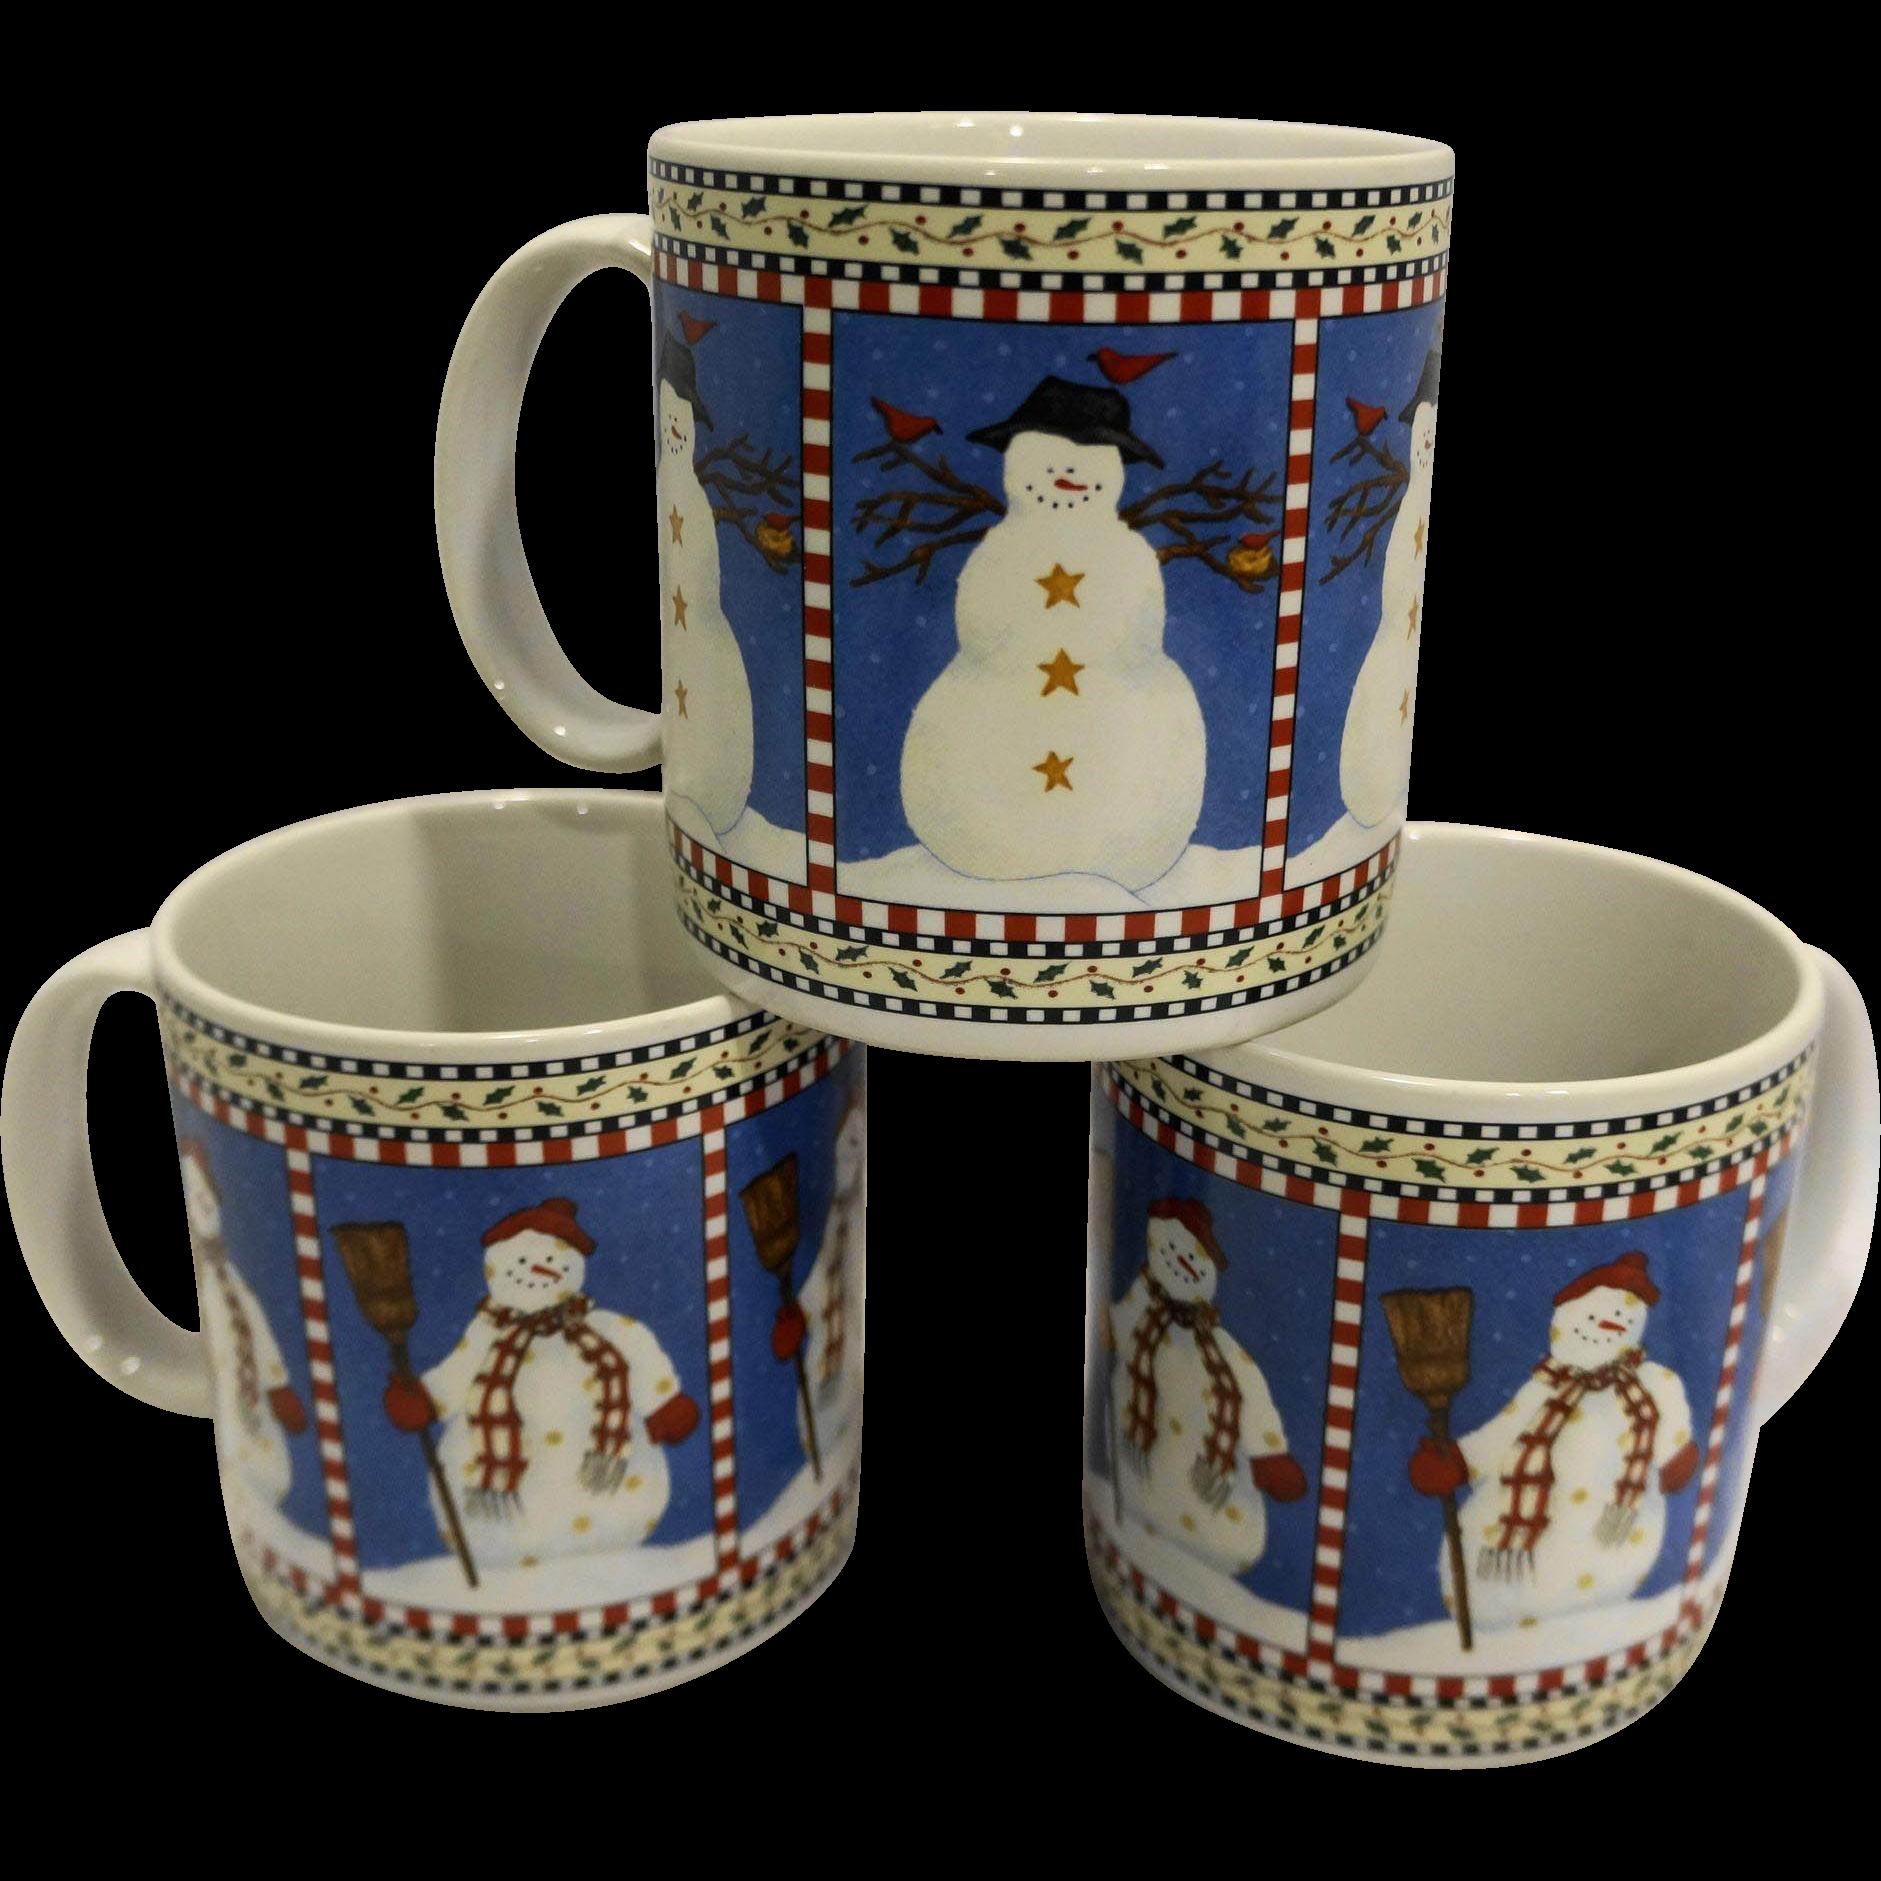 Debbie Mumm Snowman Sakura Oneida Mugs